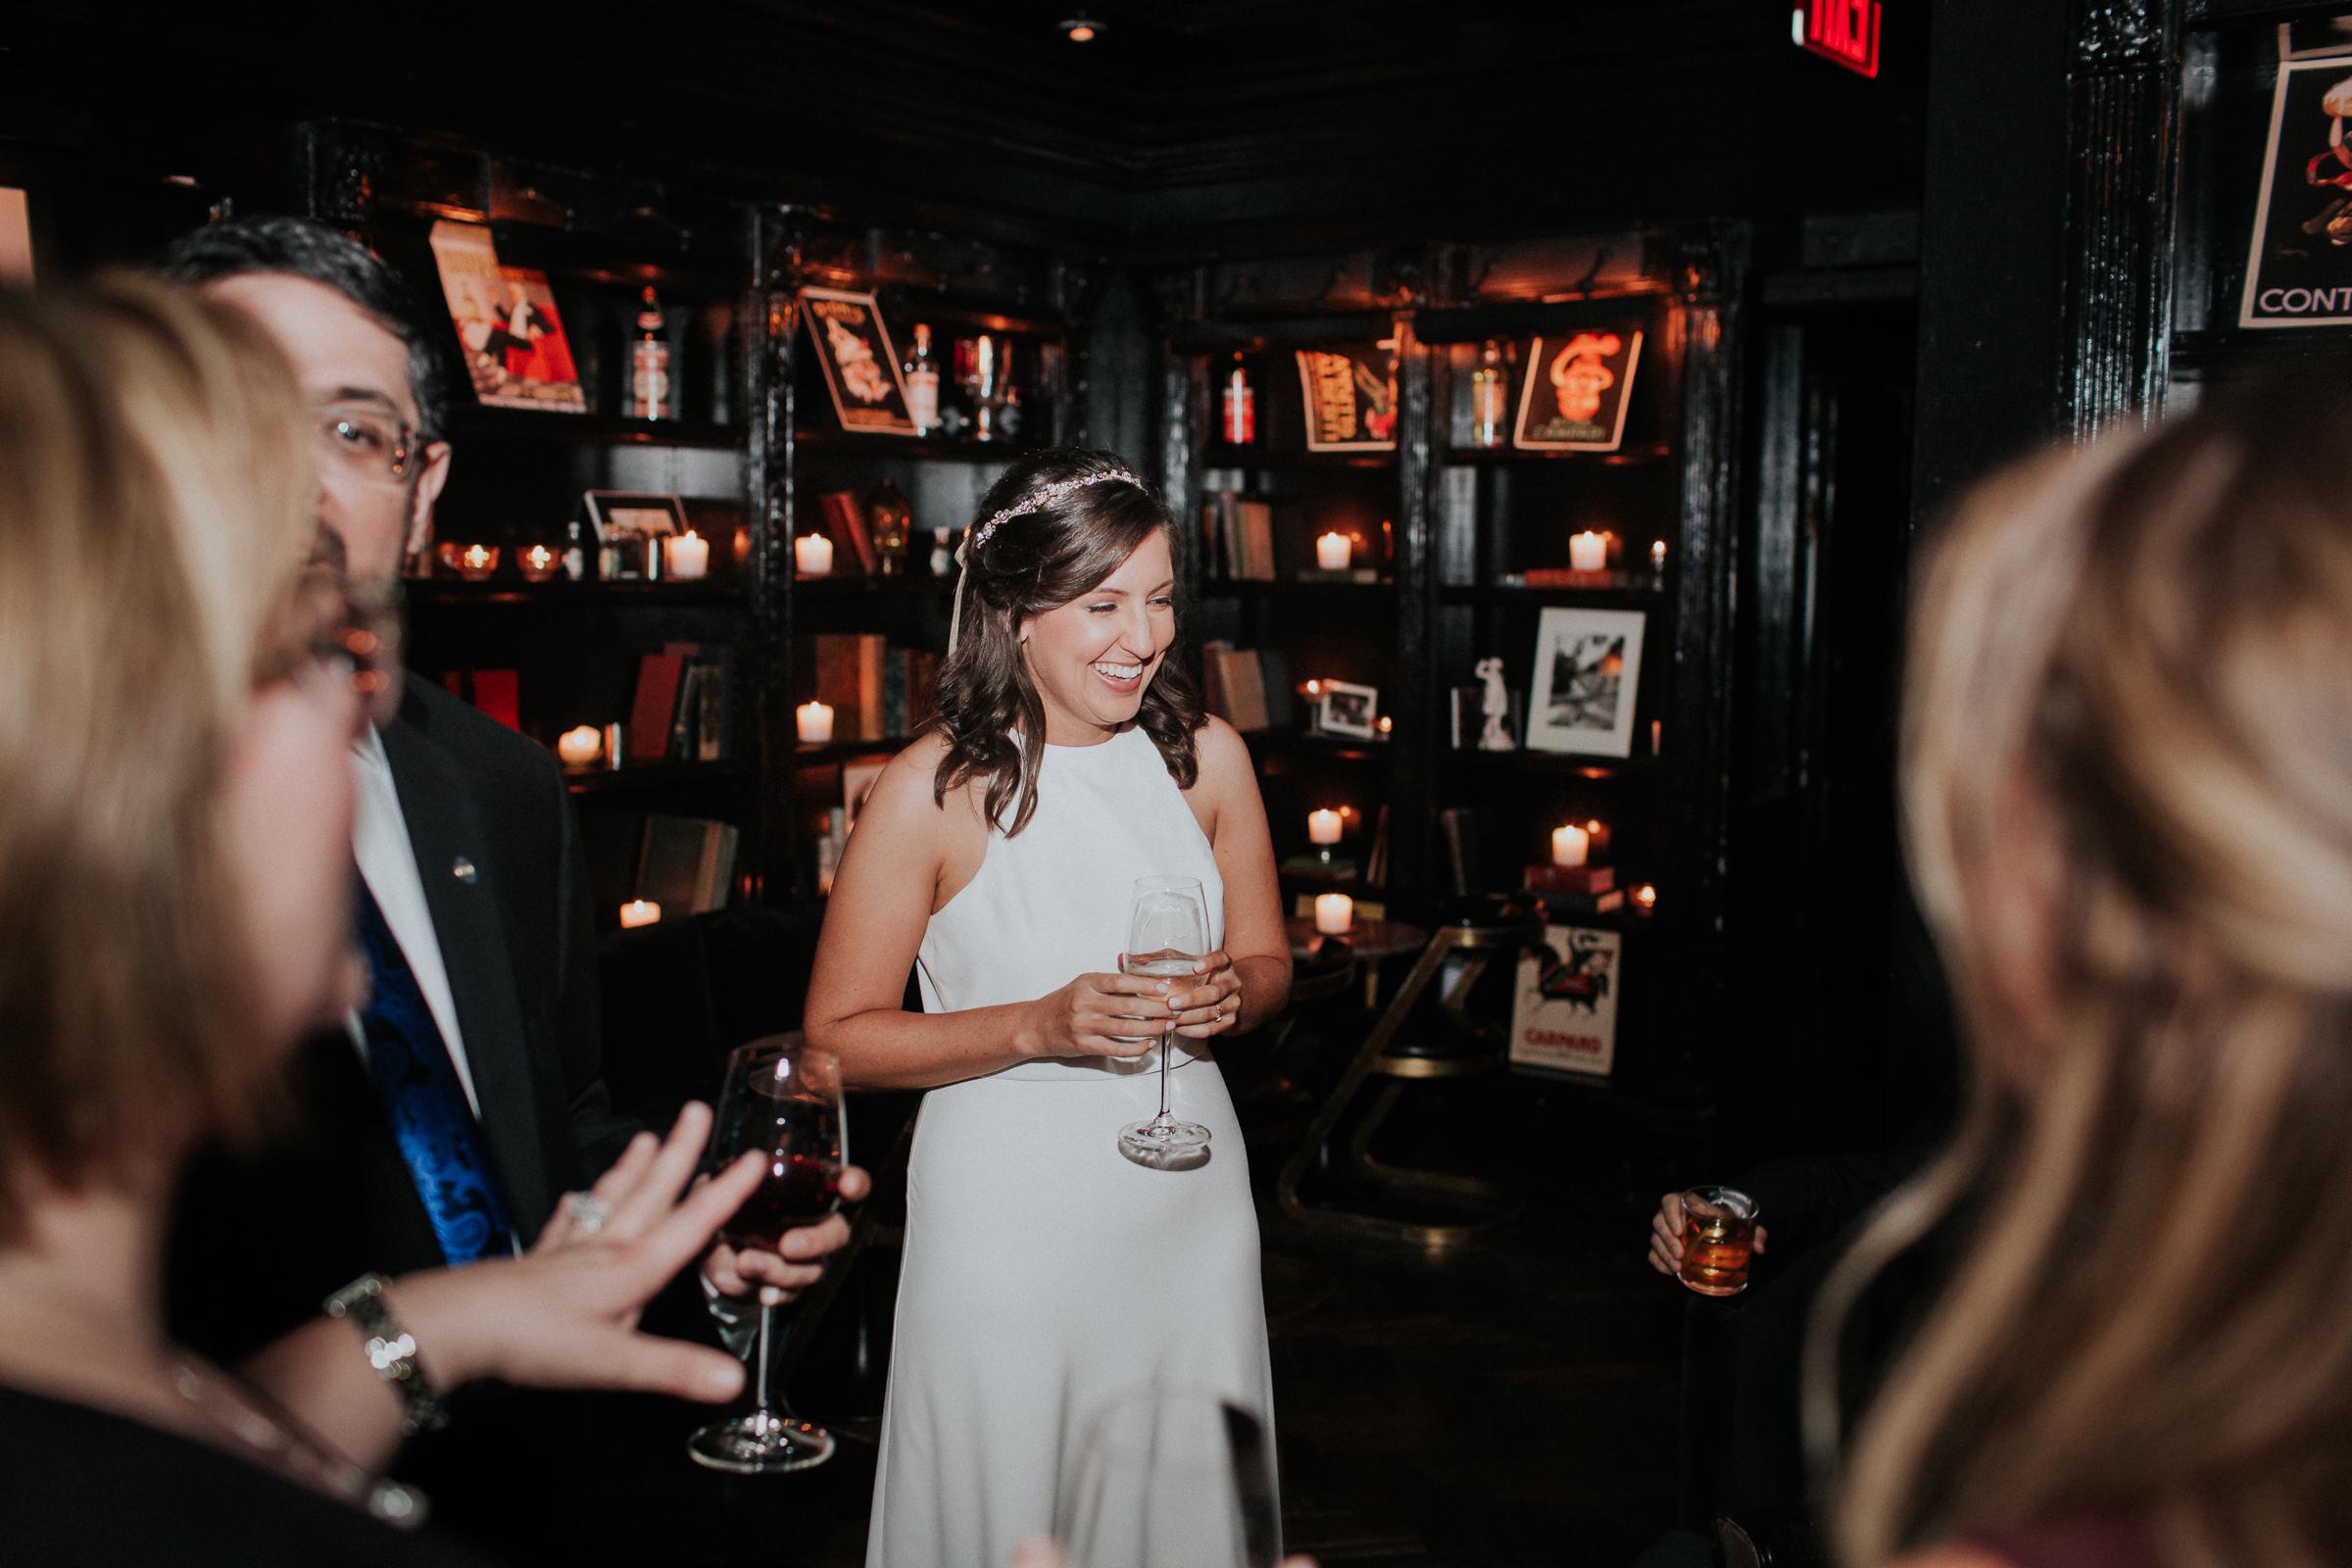 Casa-Apicii-Intimate-Wedding-City-Hall-Elopement-New-York-Documentary-Wedding-Photographer-51.jpg